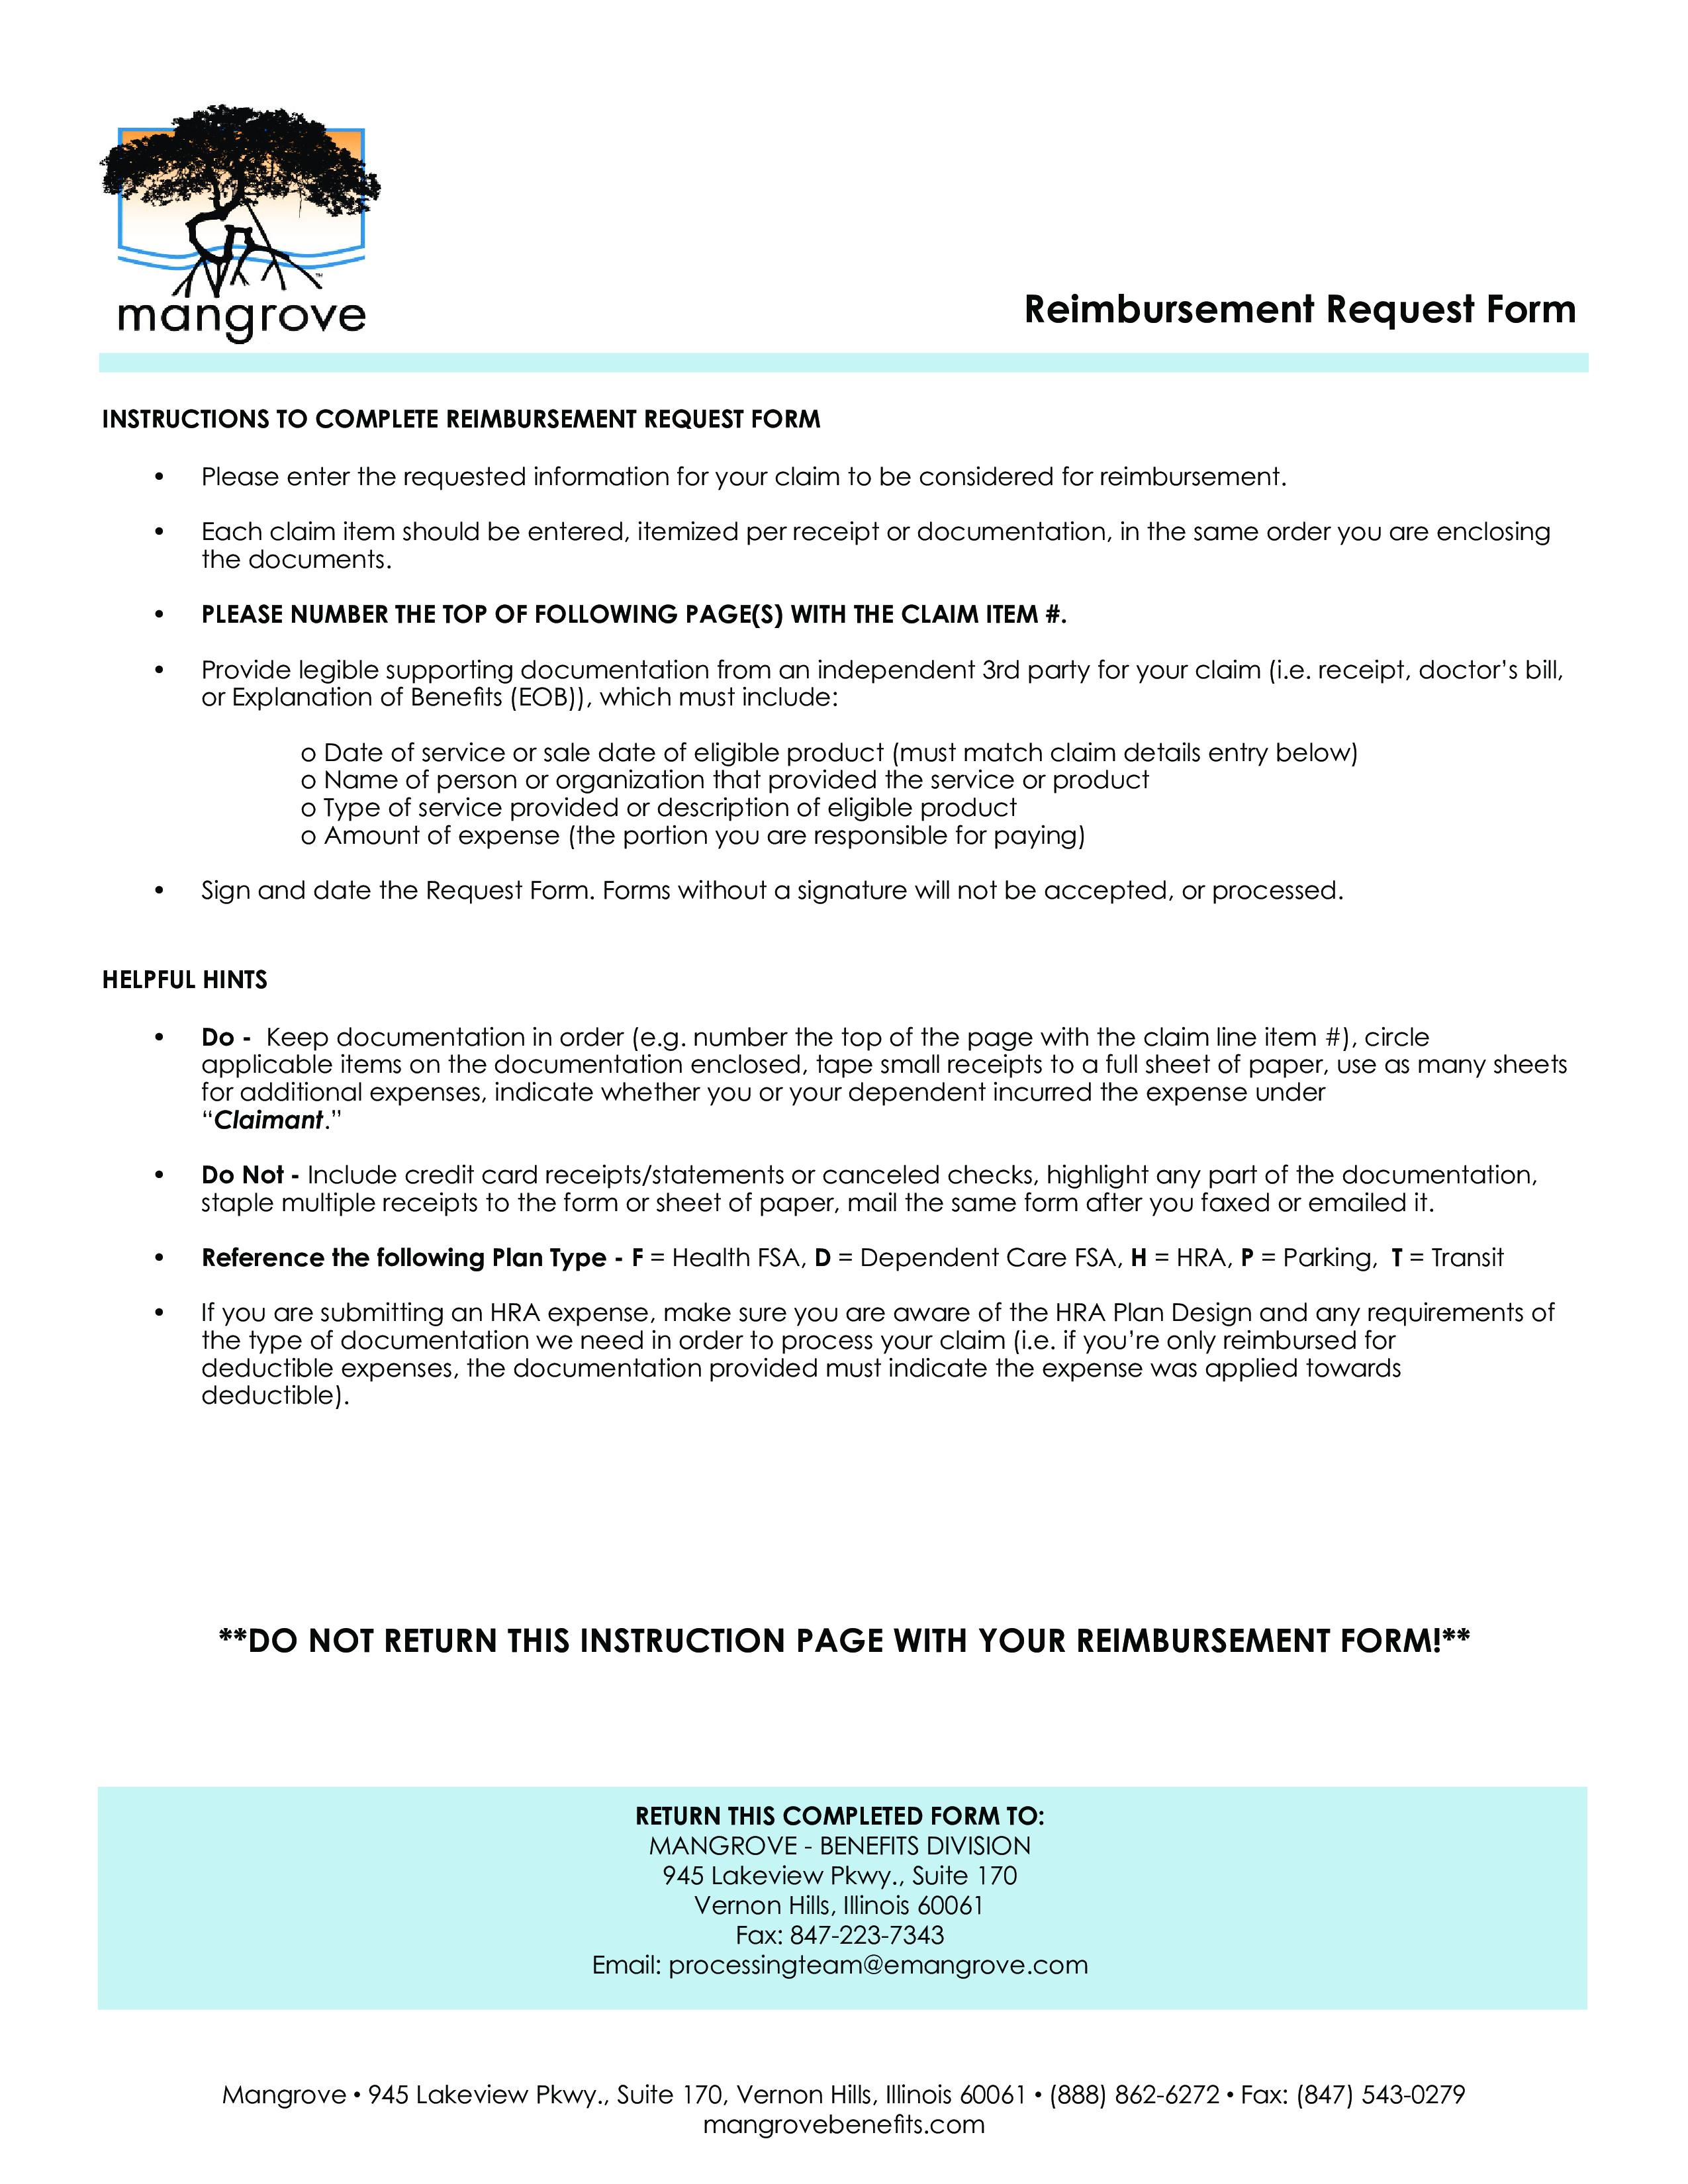 Reimbursement Request Form How To Create A Reimbursement Request Form Download This Reimbursement Request Form Template Templates Request Business Template